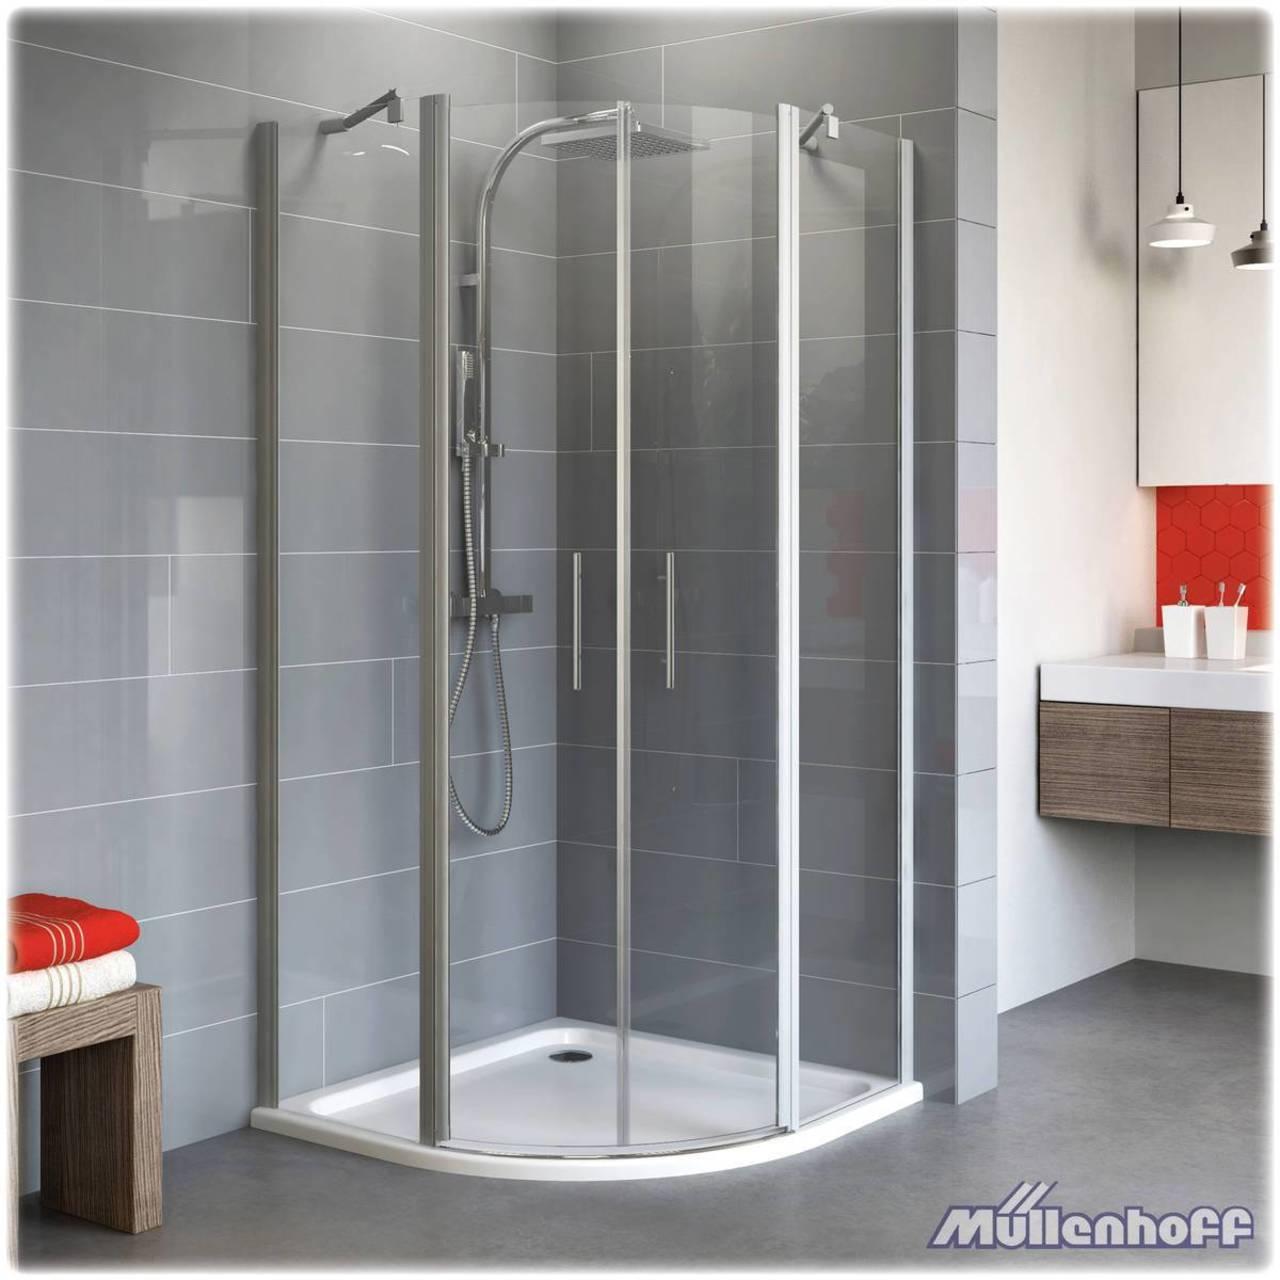 schulte alexa style 2 0 runddusche 900 900 mm radius 500. Black Bedroom Furniture Sets. Home Design Ideas